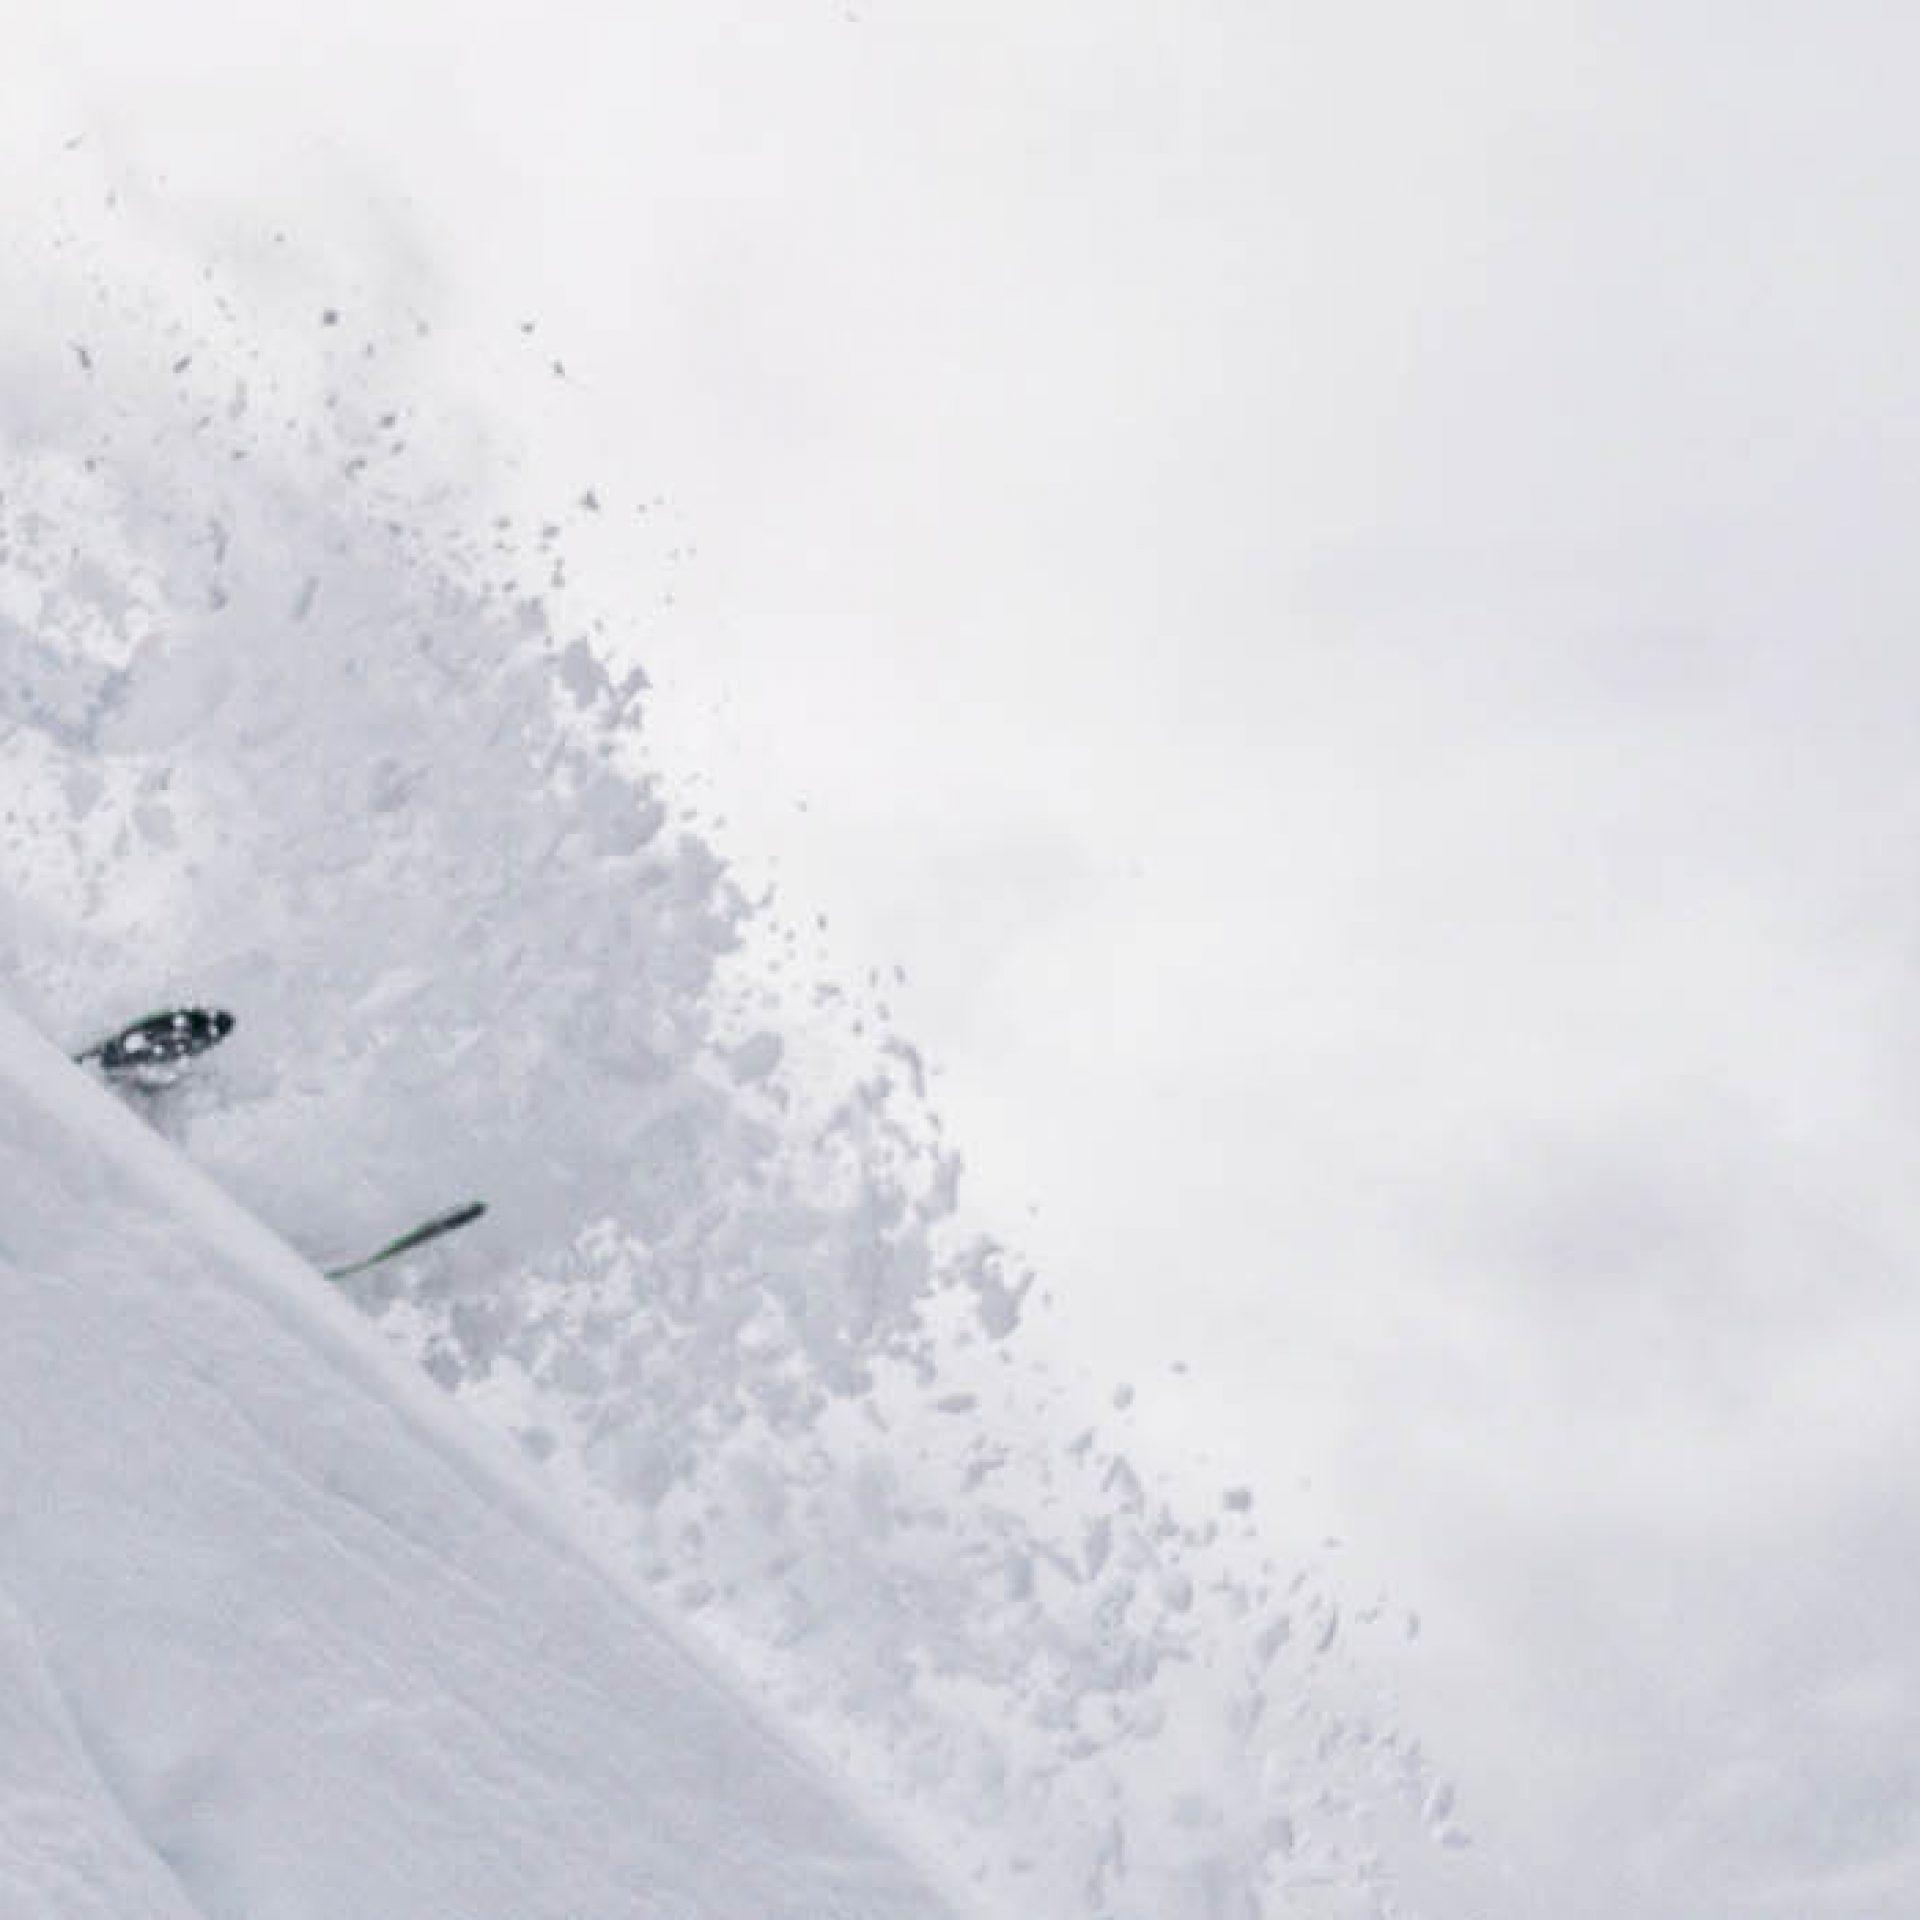 Cole Richardson skiing Lipalian Chutes at Lake Louise Ski Resort, Banff National Park.